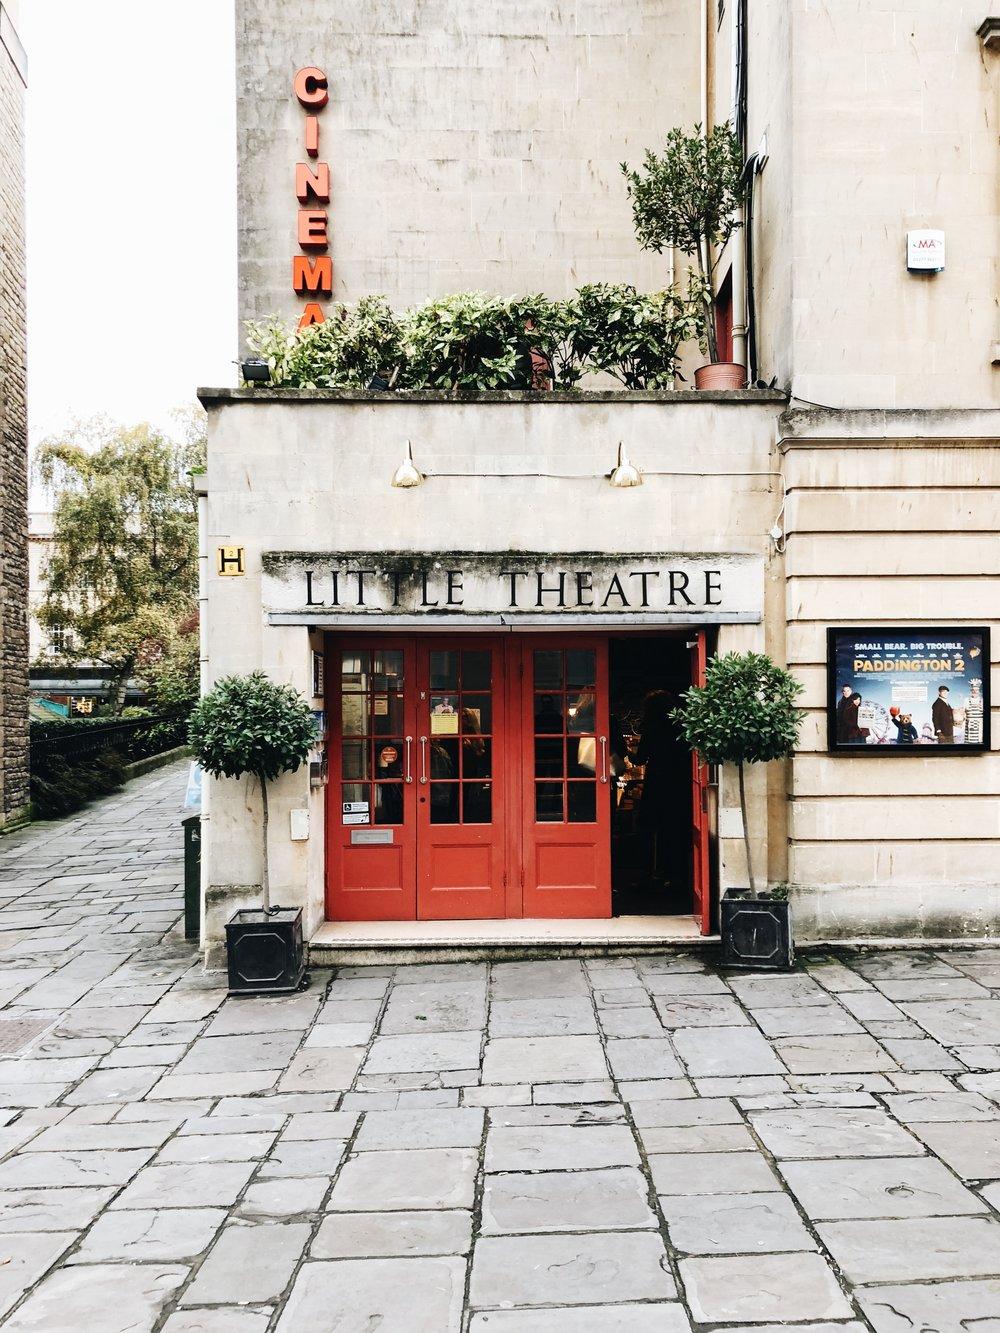 Little Theatre | Bath, England | Sea of Atlas